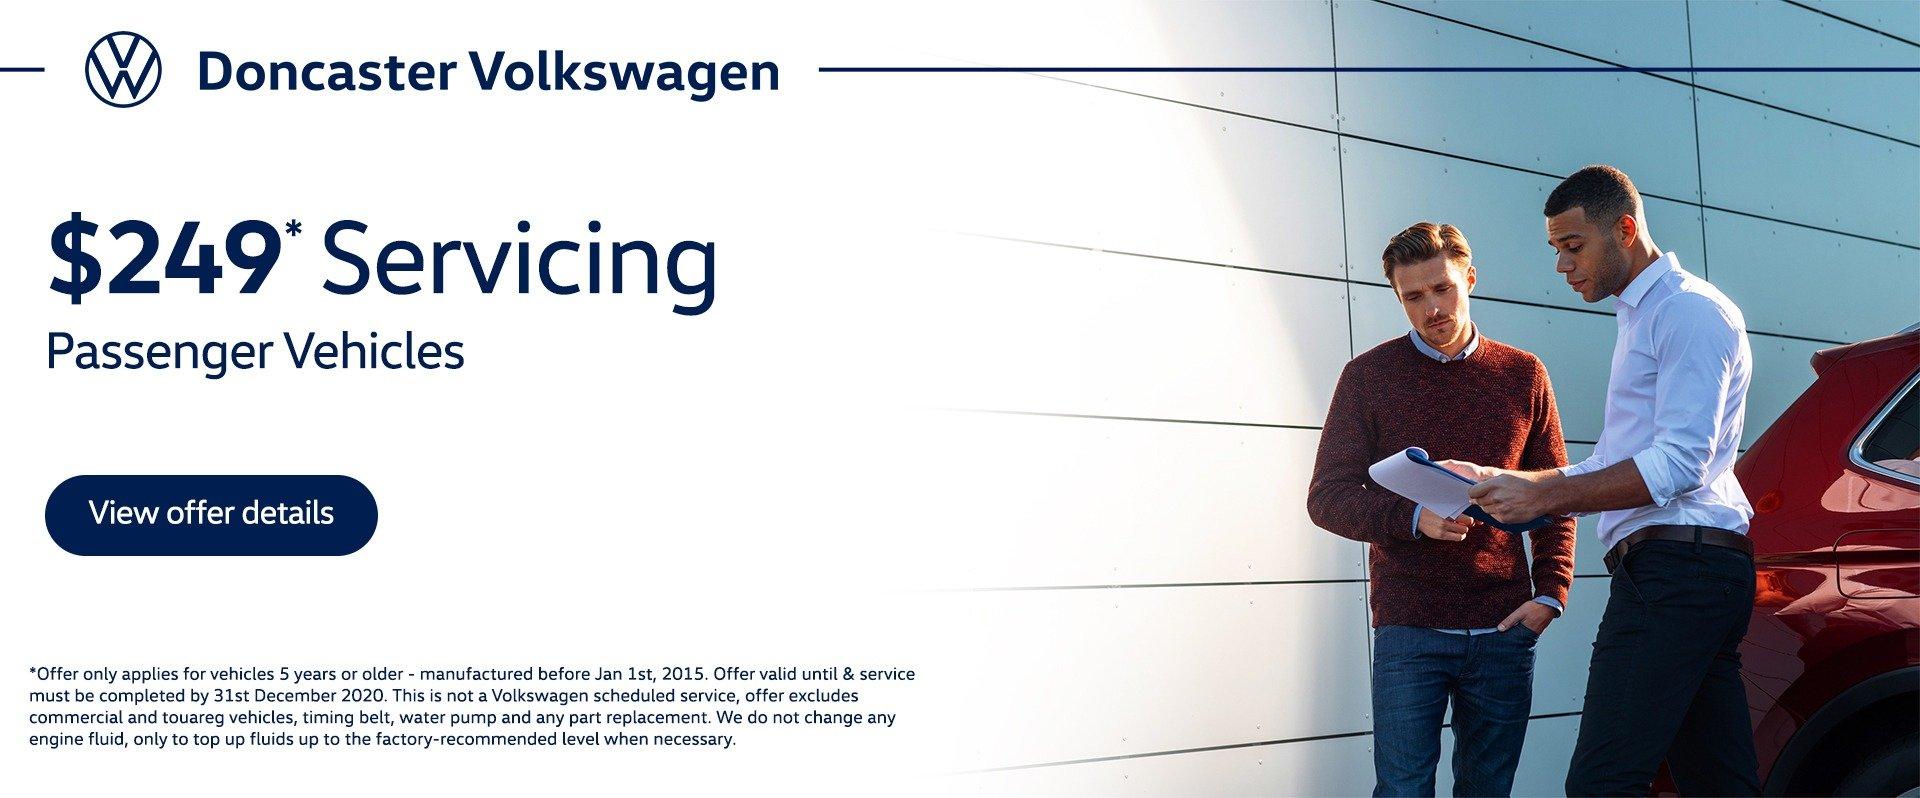 Doncaster Volkswagen Service Special